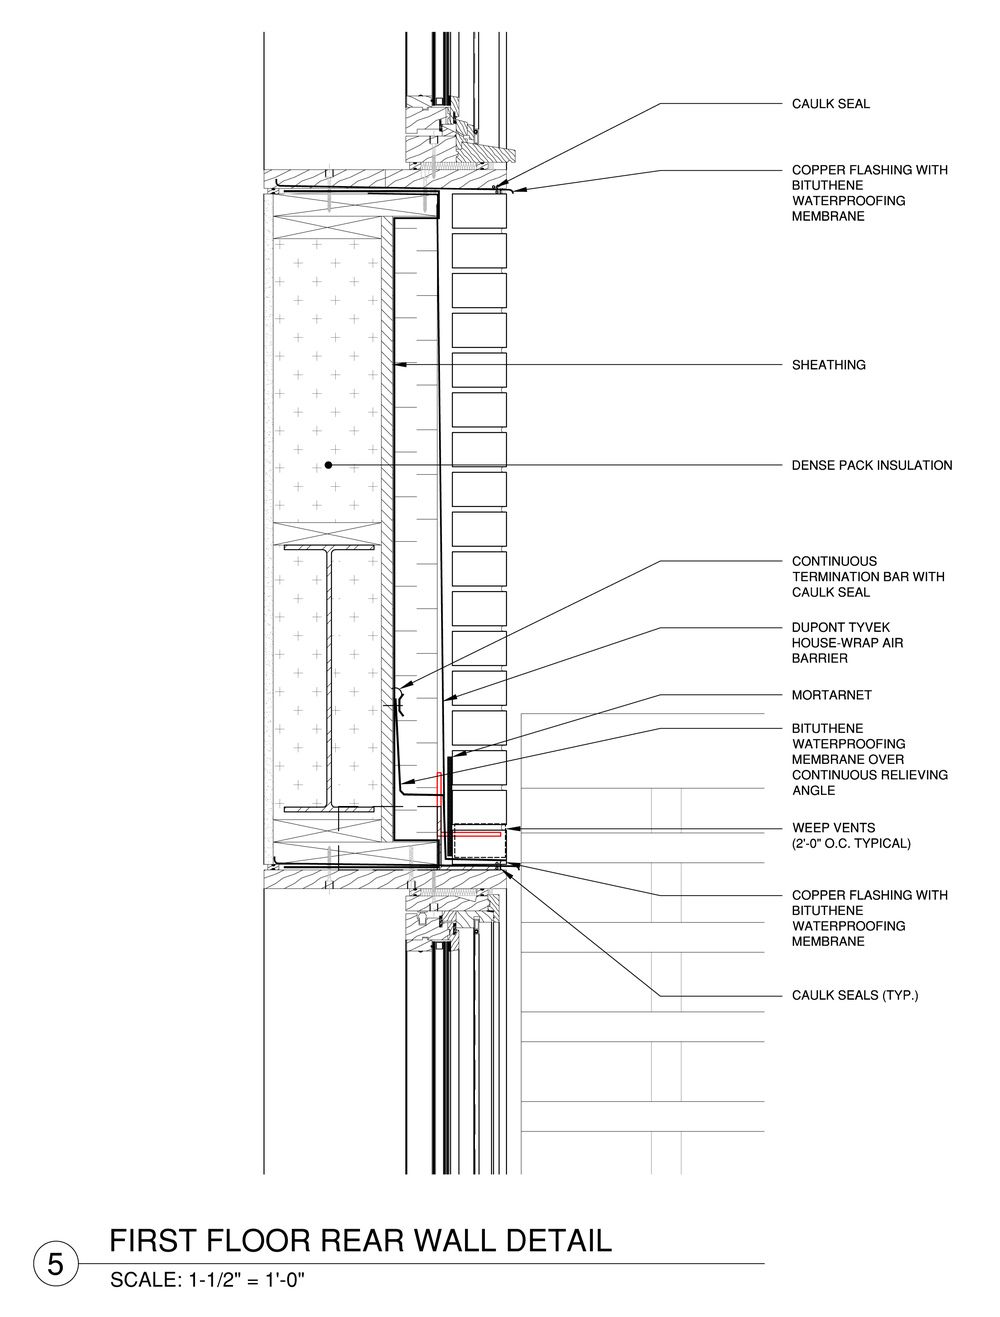 10 - Wall Detail.jpg